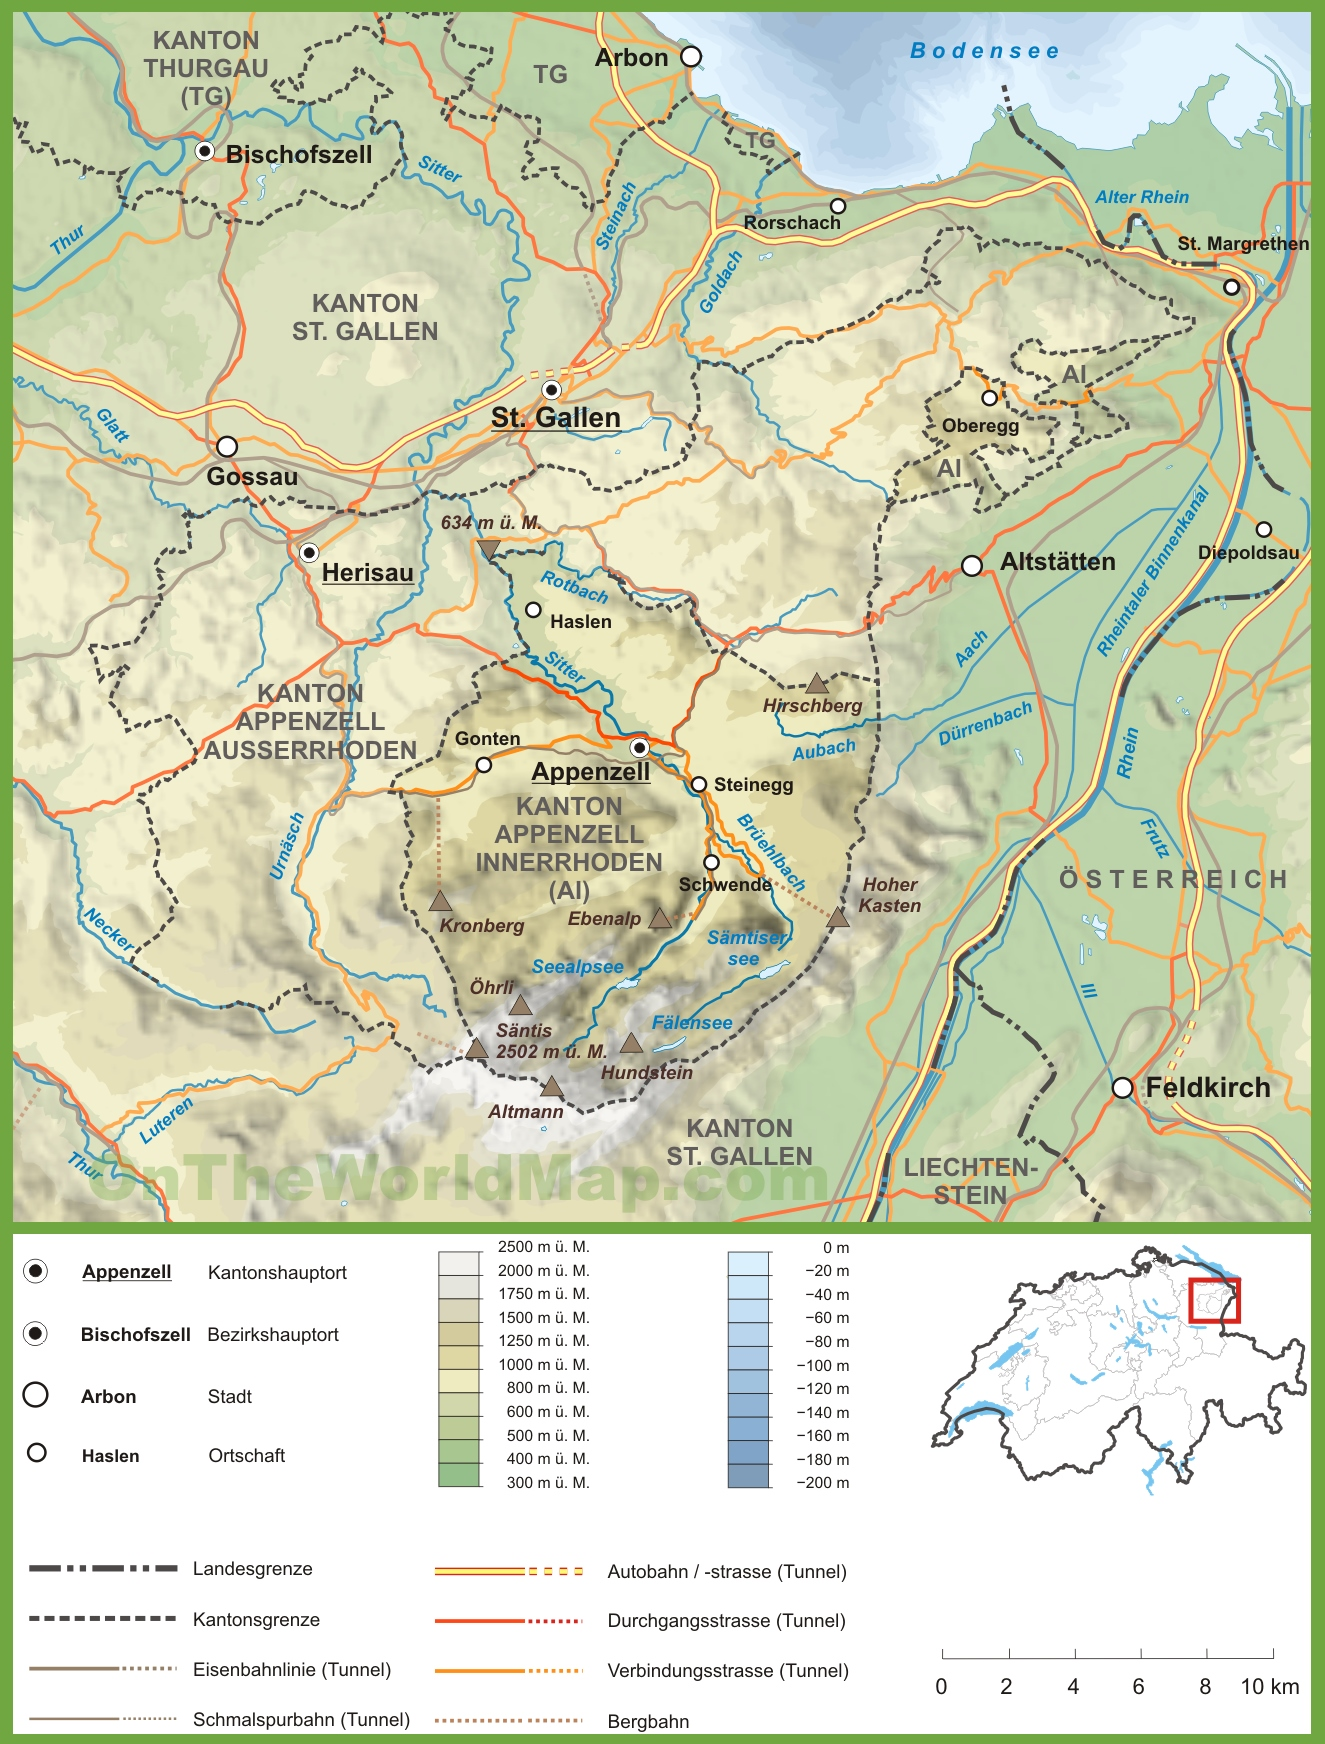 Canton of Appenzell Innerrhoden road map